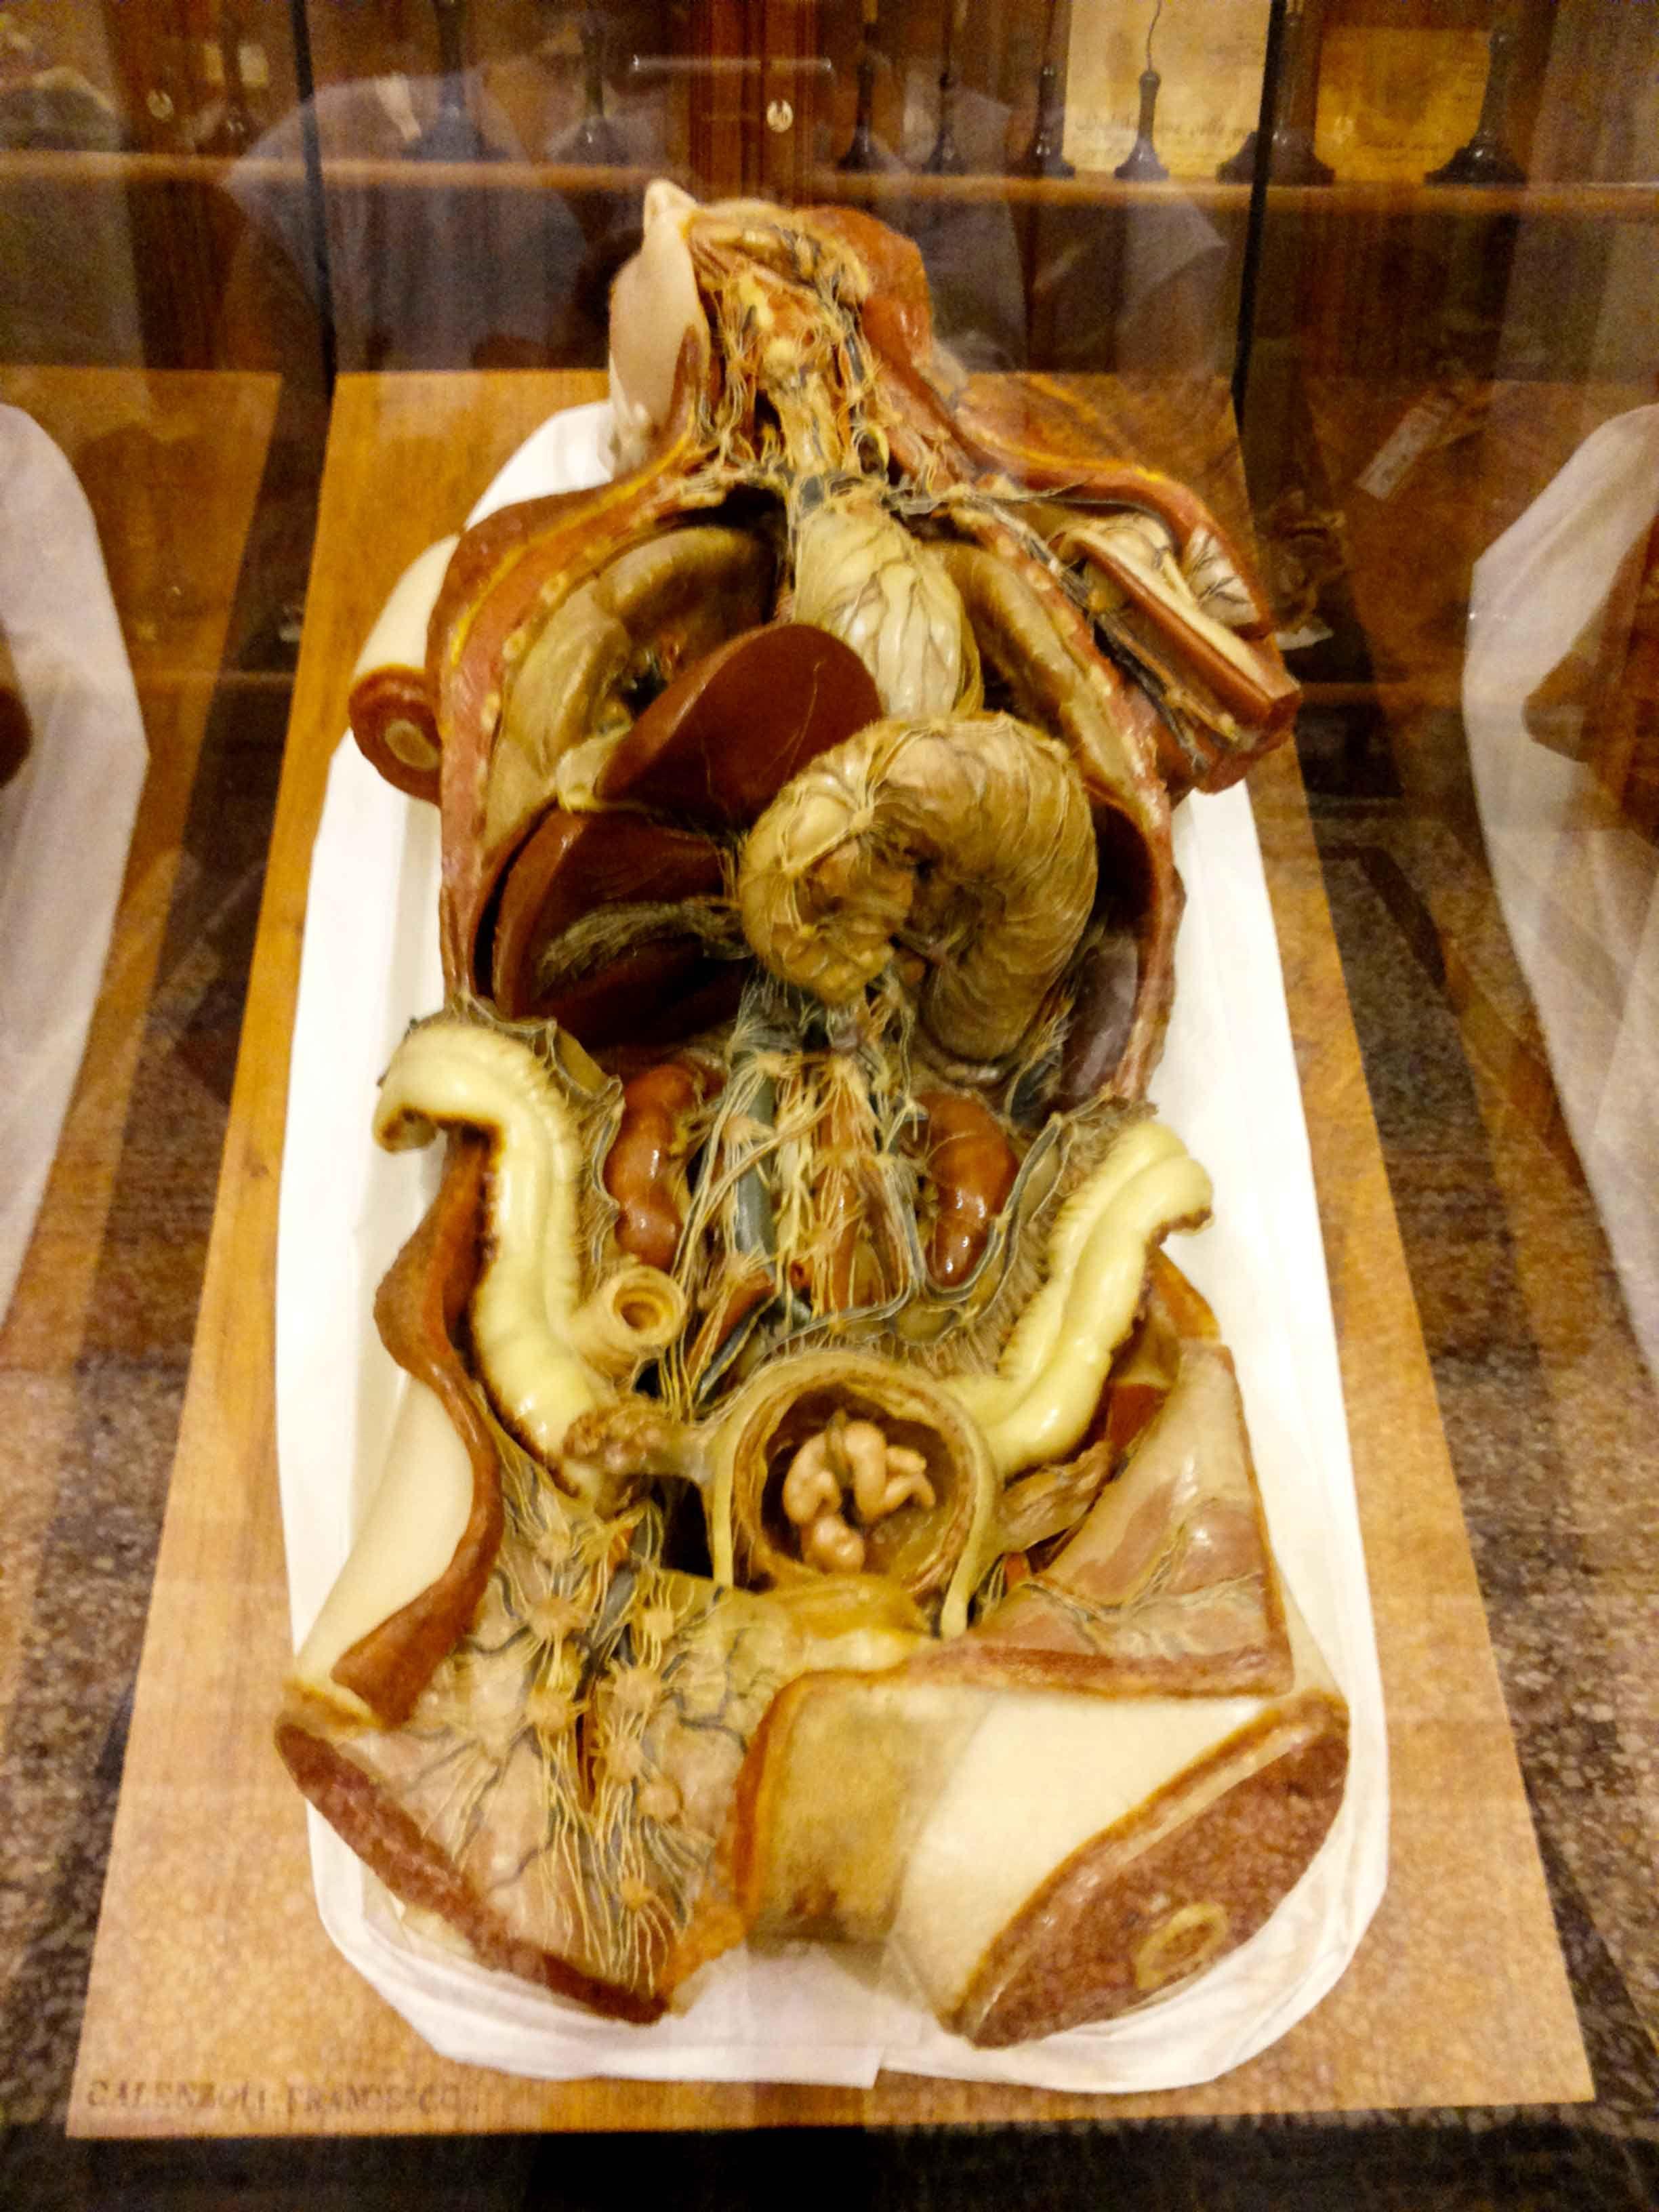 Museo di Anatomia Umana di Torino   Medicine   Pinterest   Human ...